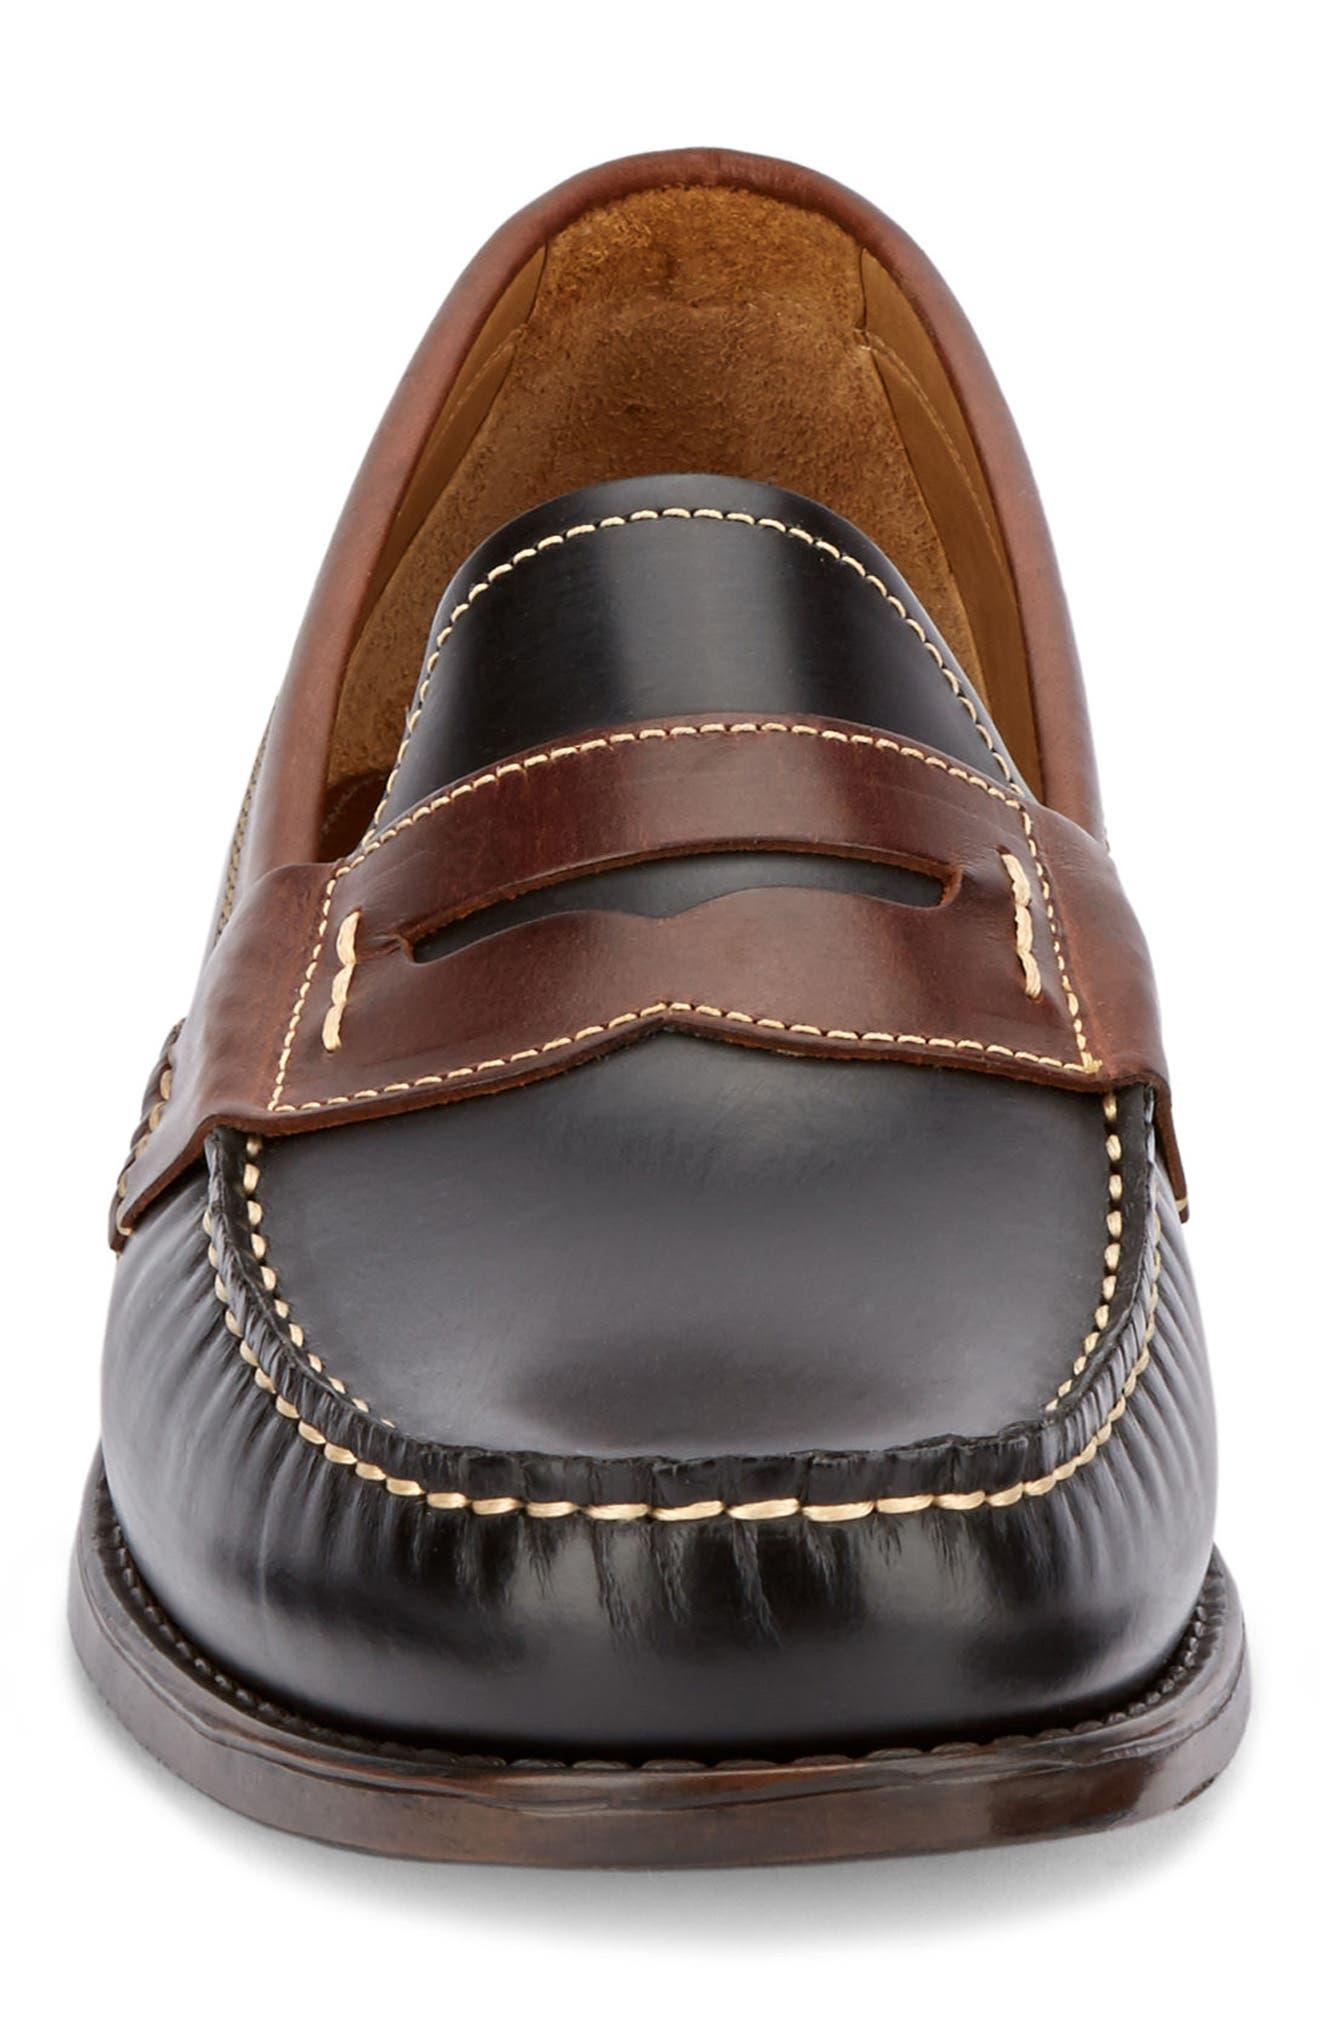 Wagner Penny Loafer,                             Alternate thumbnail 4, color,                             Black/ Dark Brown Leather